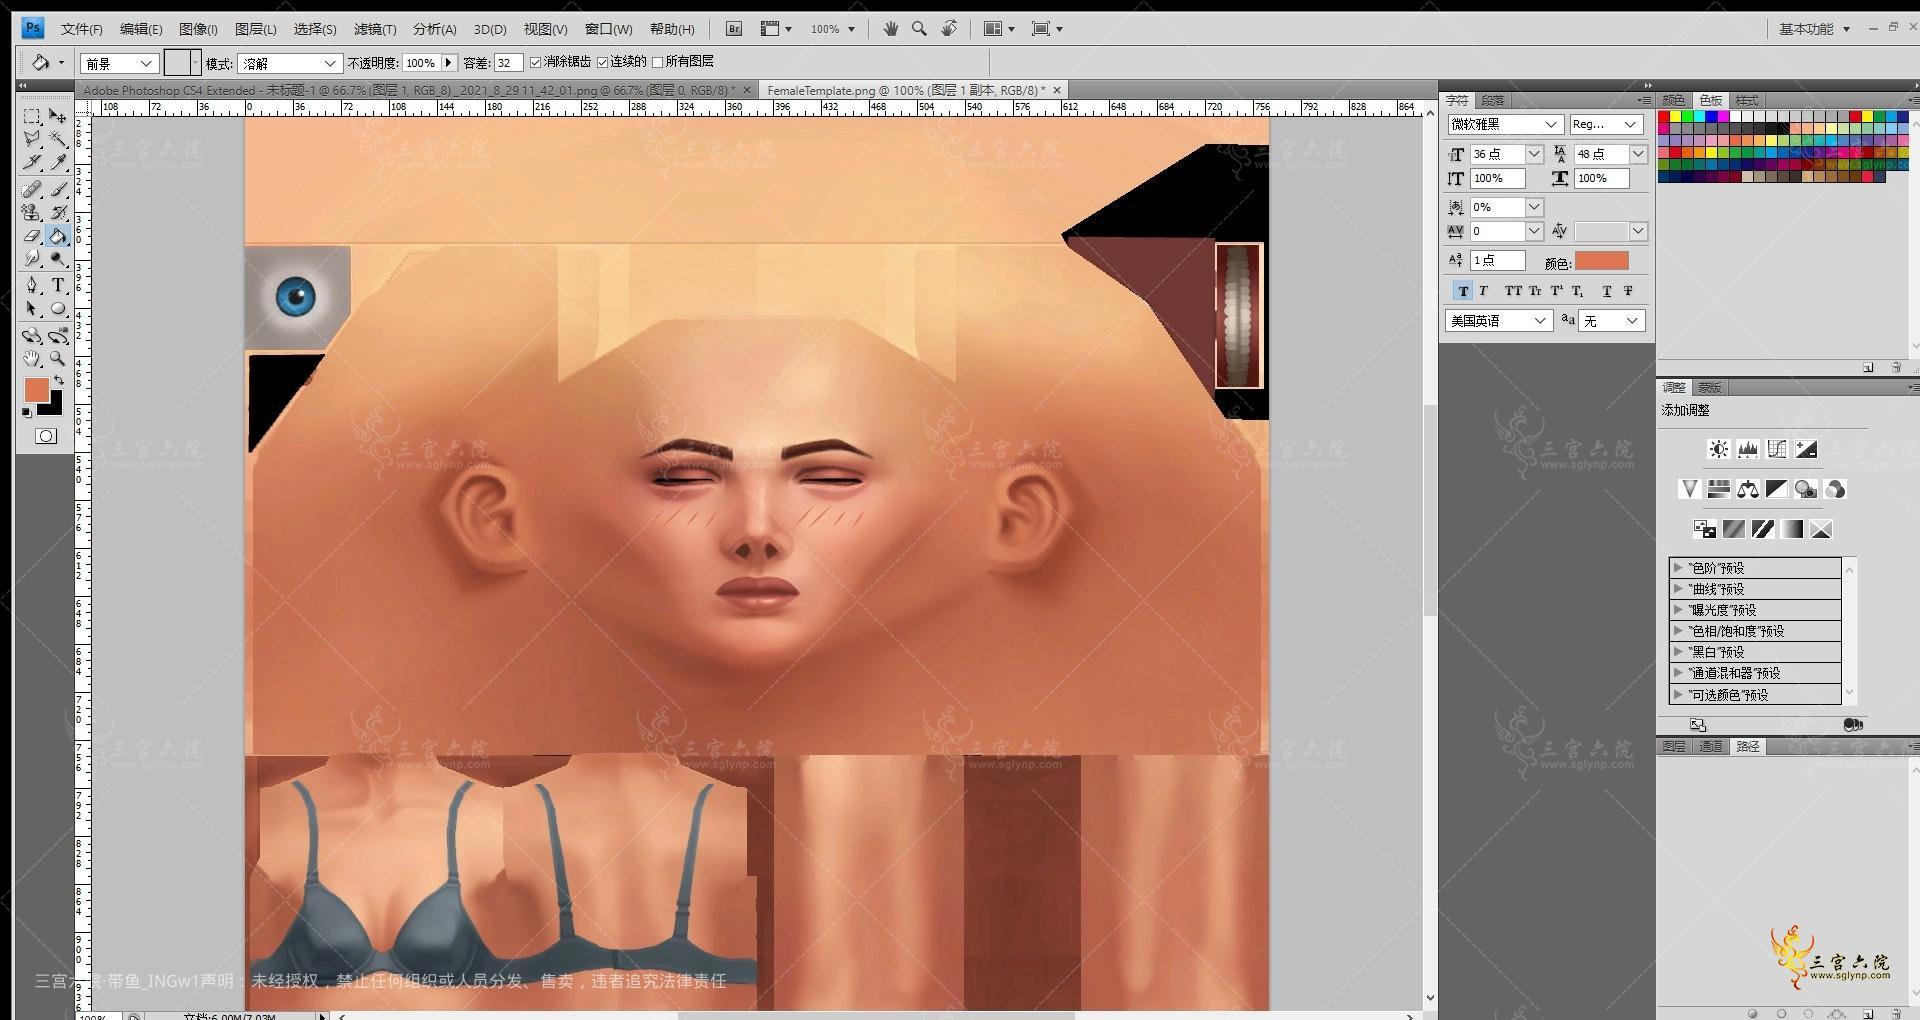 Adobe Photoshop CS4 Extended - FemaleTemplate.png @ 100% (图层 3, RGB_8) _ 2021_.png